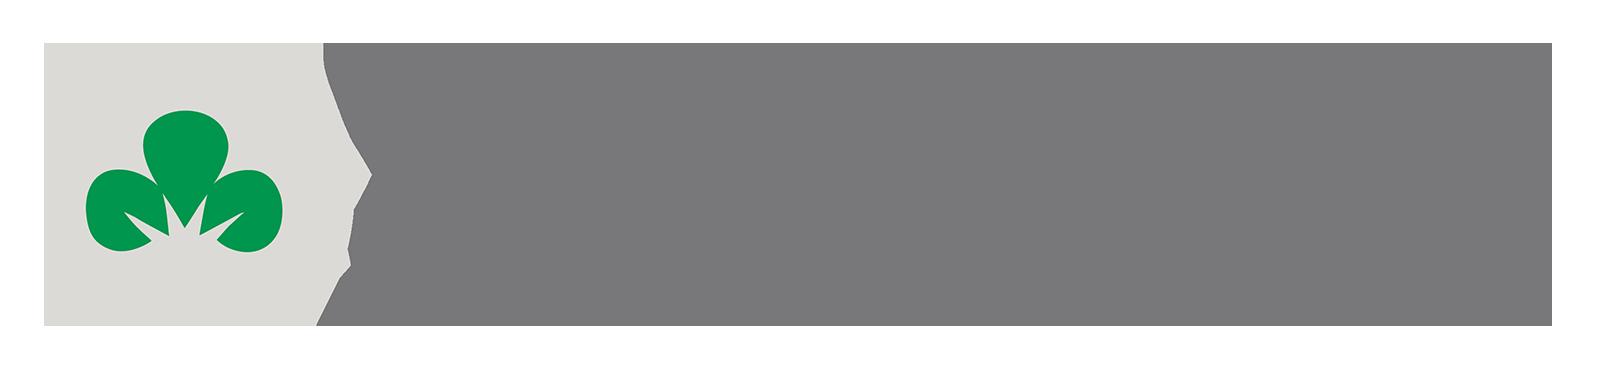 Shamrock Financial Corporation Logo